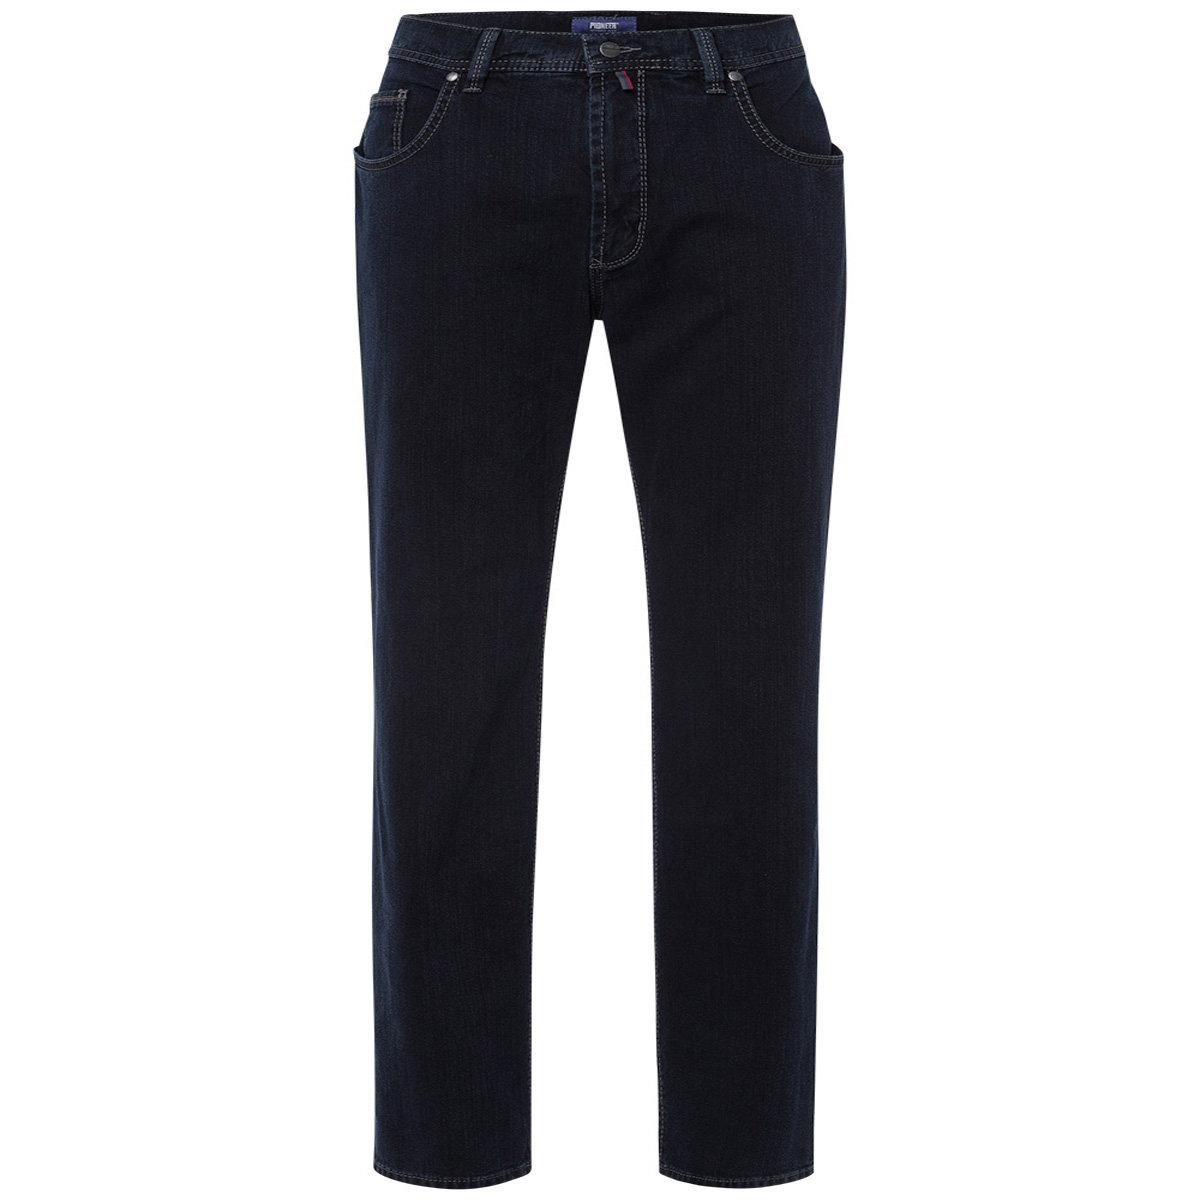 jeans stretch pionier herren bergr e peter 67 95. Black Bedroom Furniture Sets. Home Design Ideas